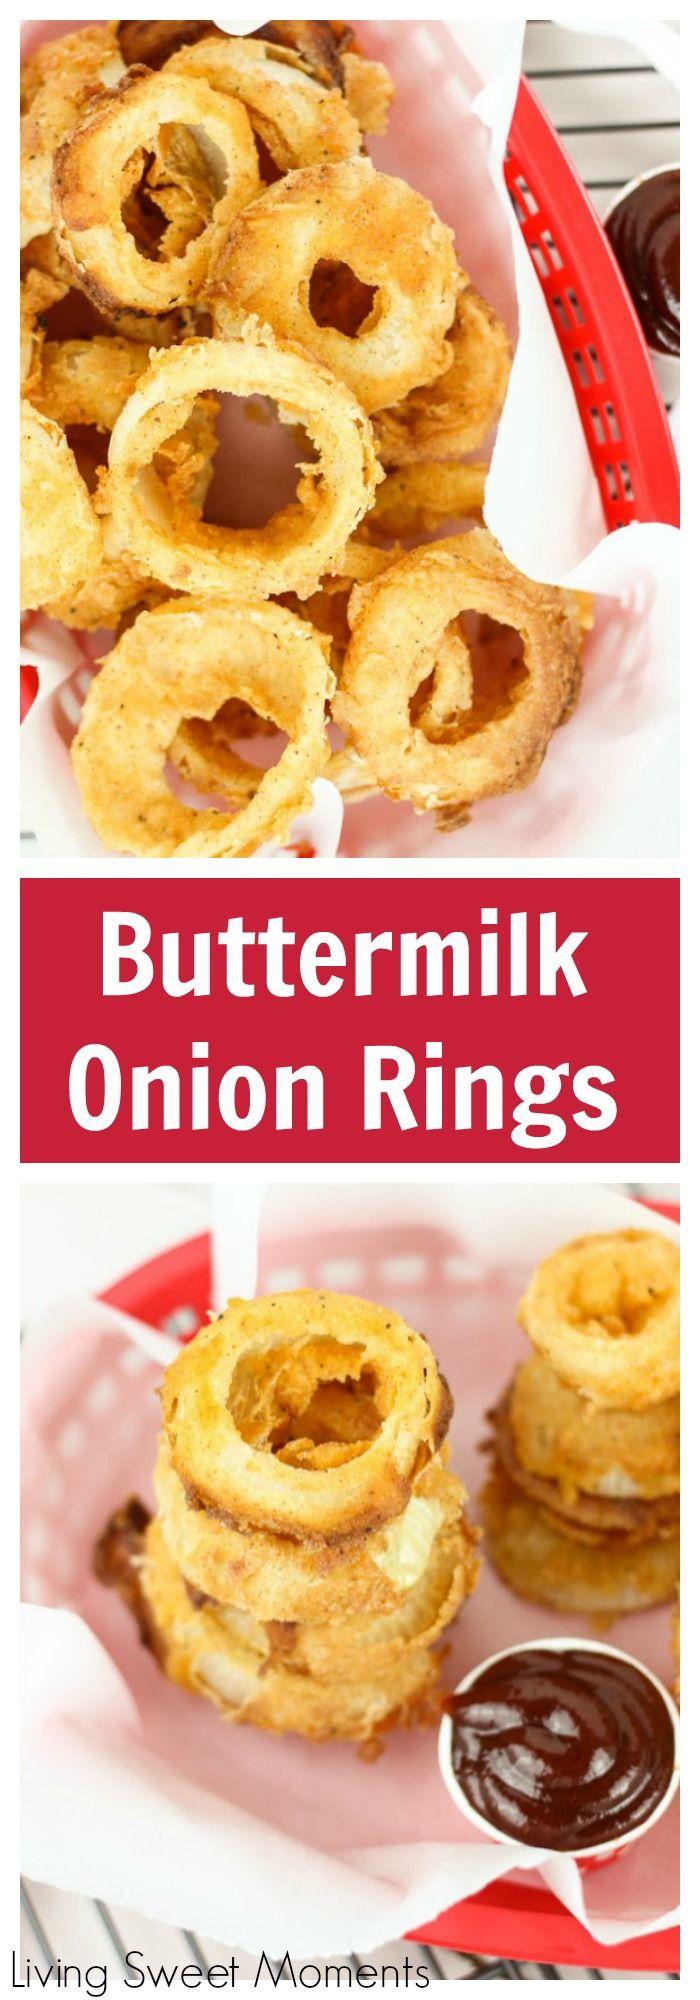 Easy Buttermilk Onion Rings Recipe Buttermilk Recipes Onion Rings Food